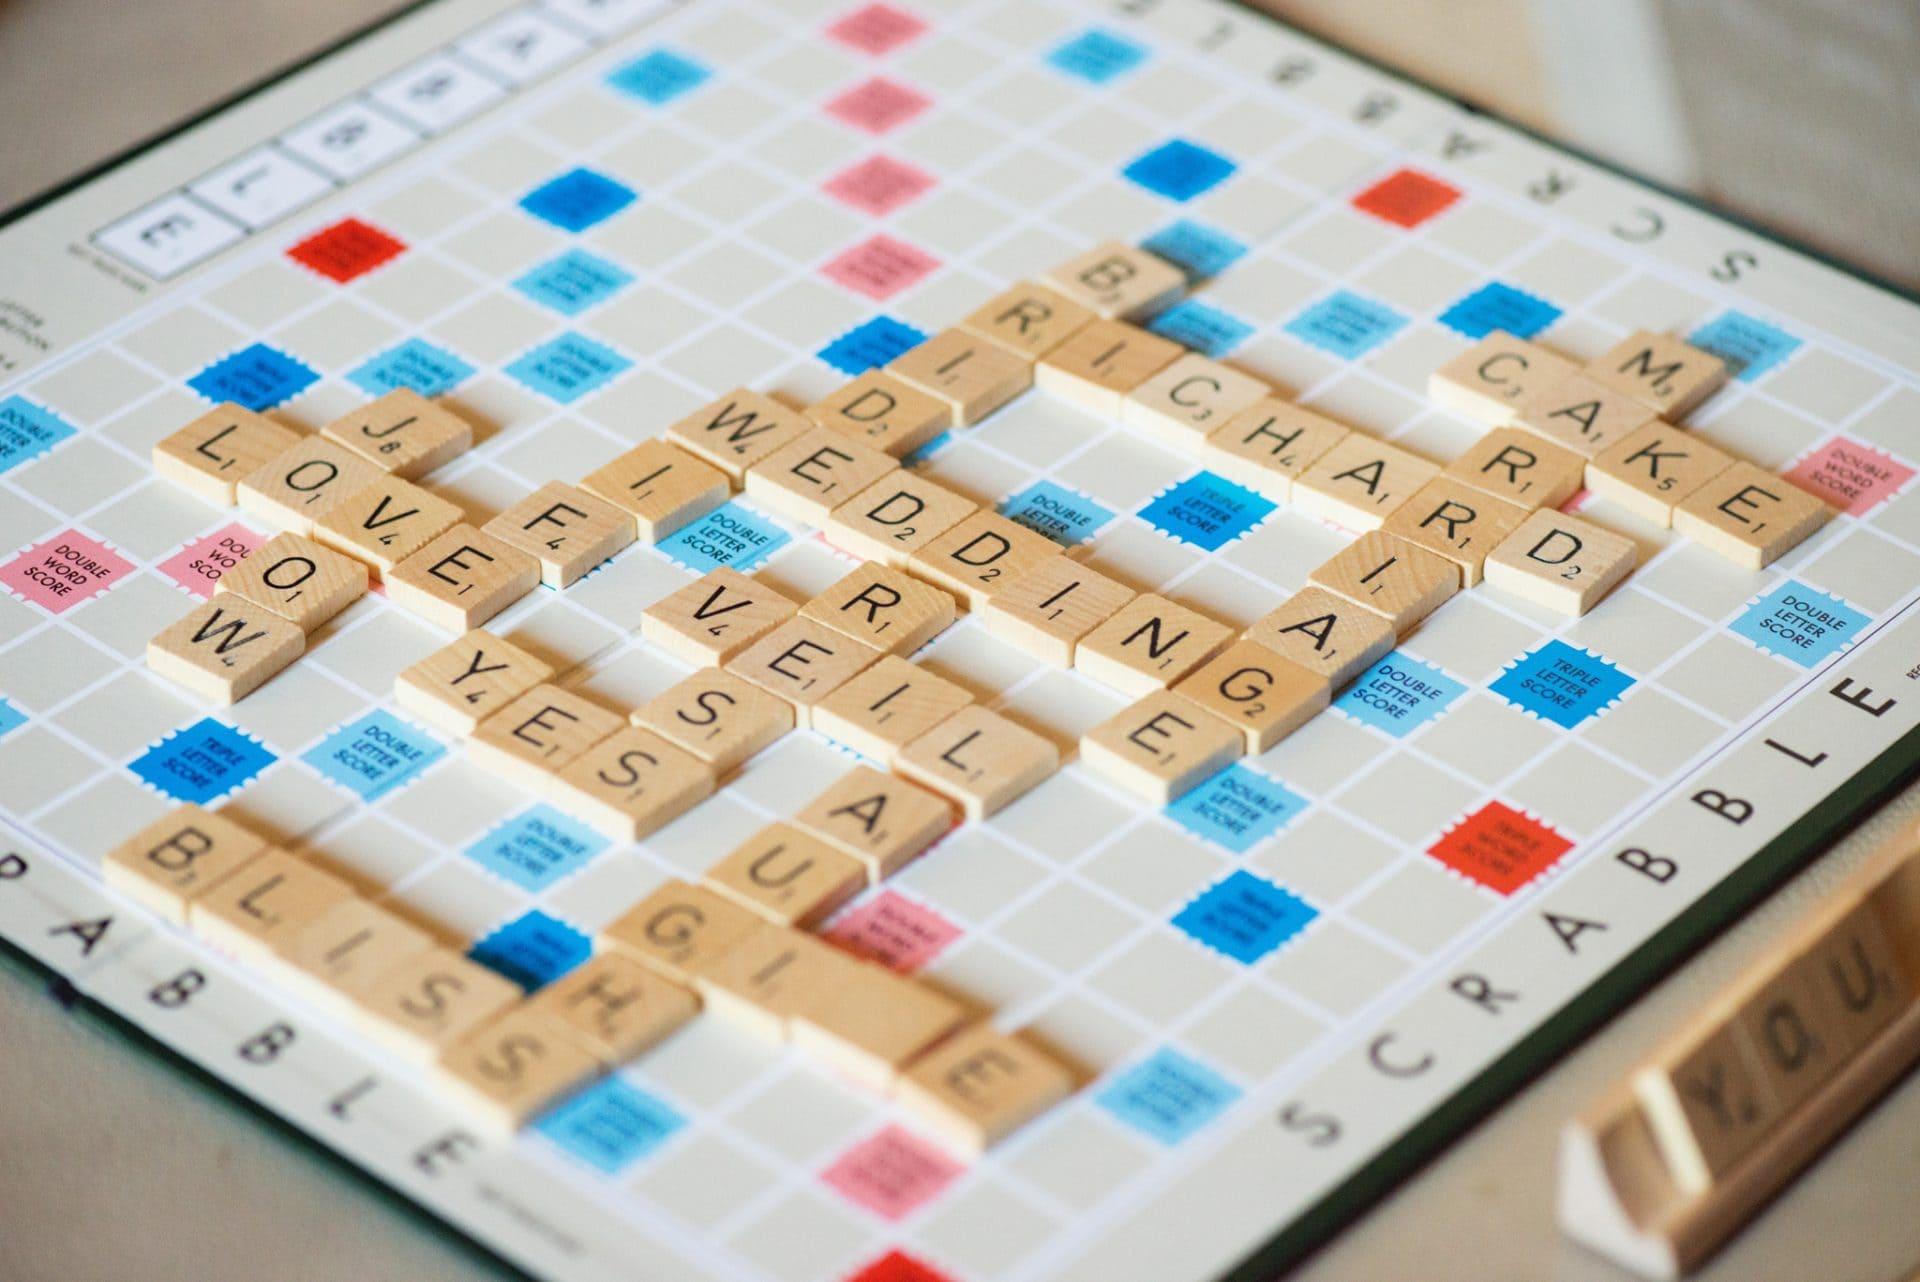 Scrabble at a wedding